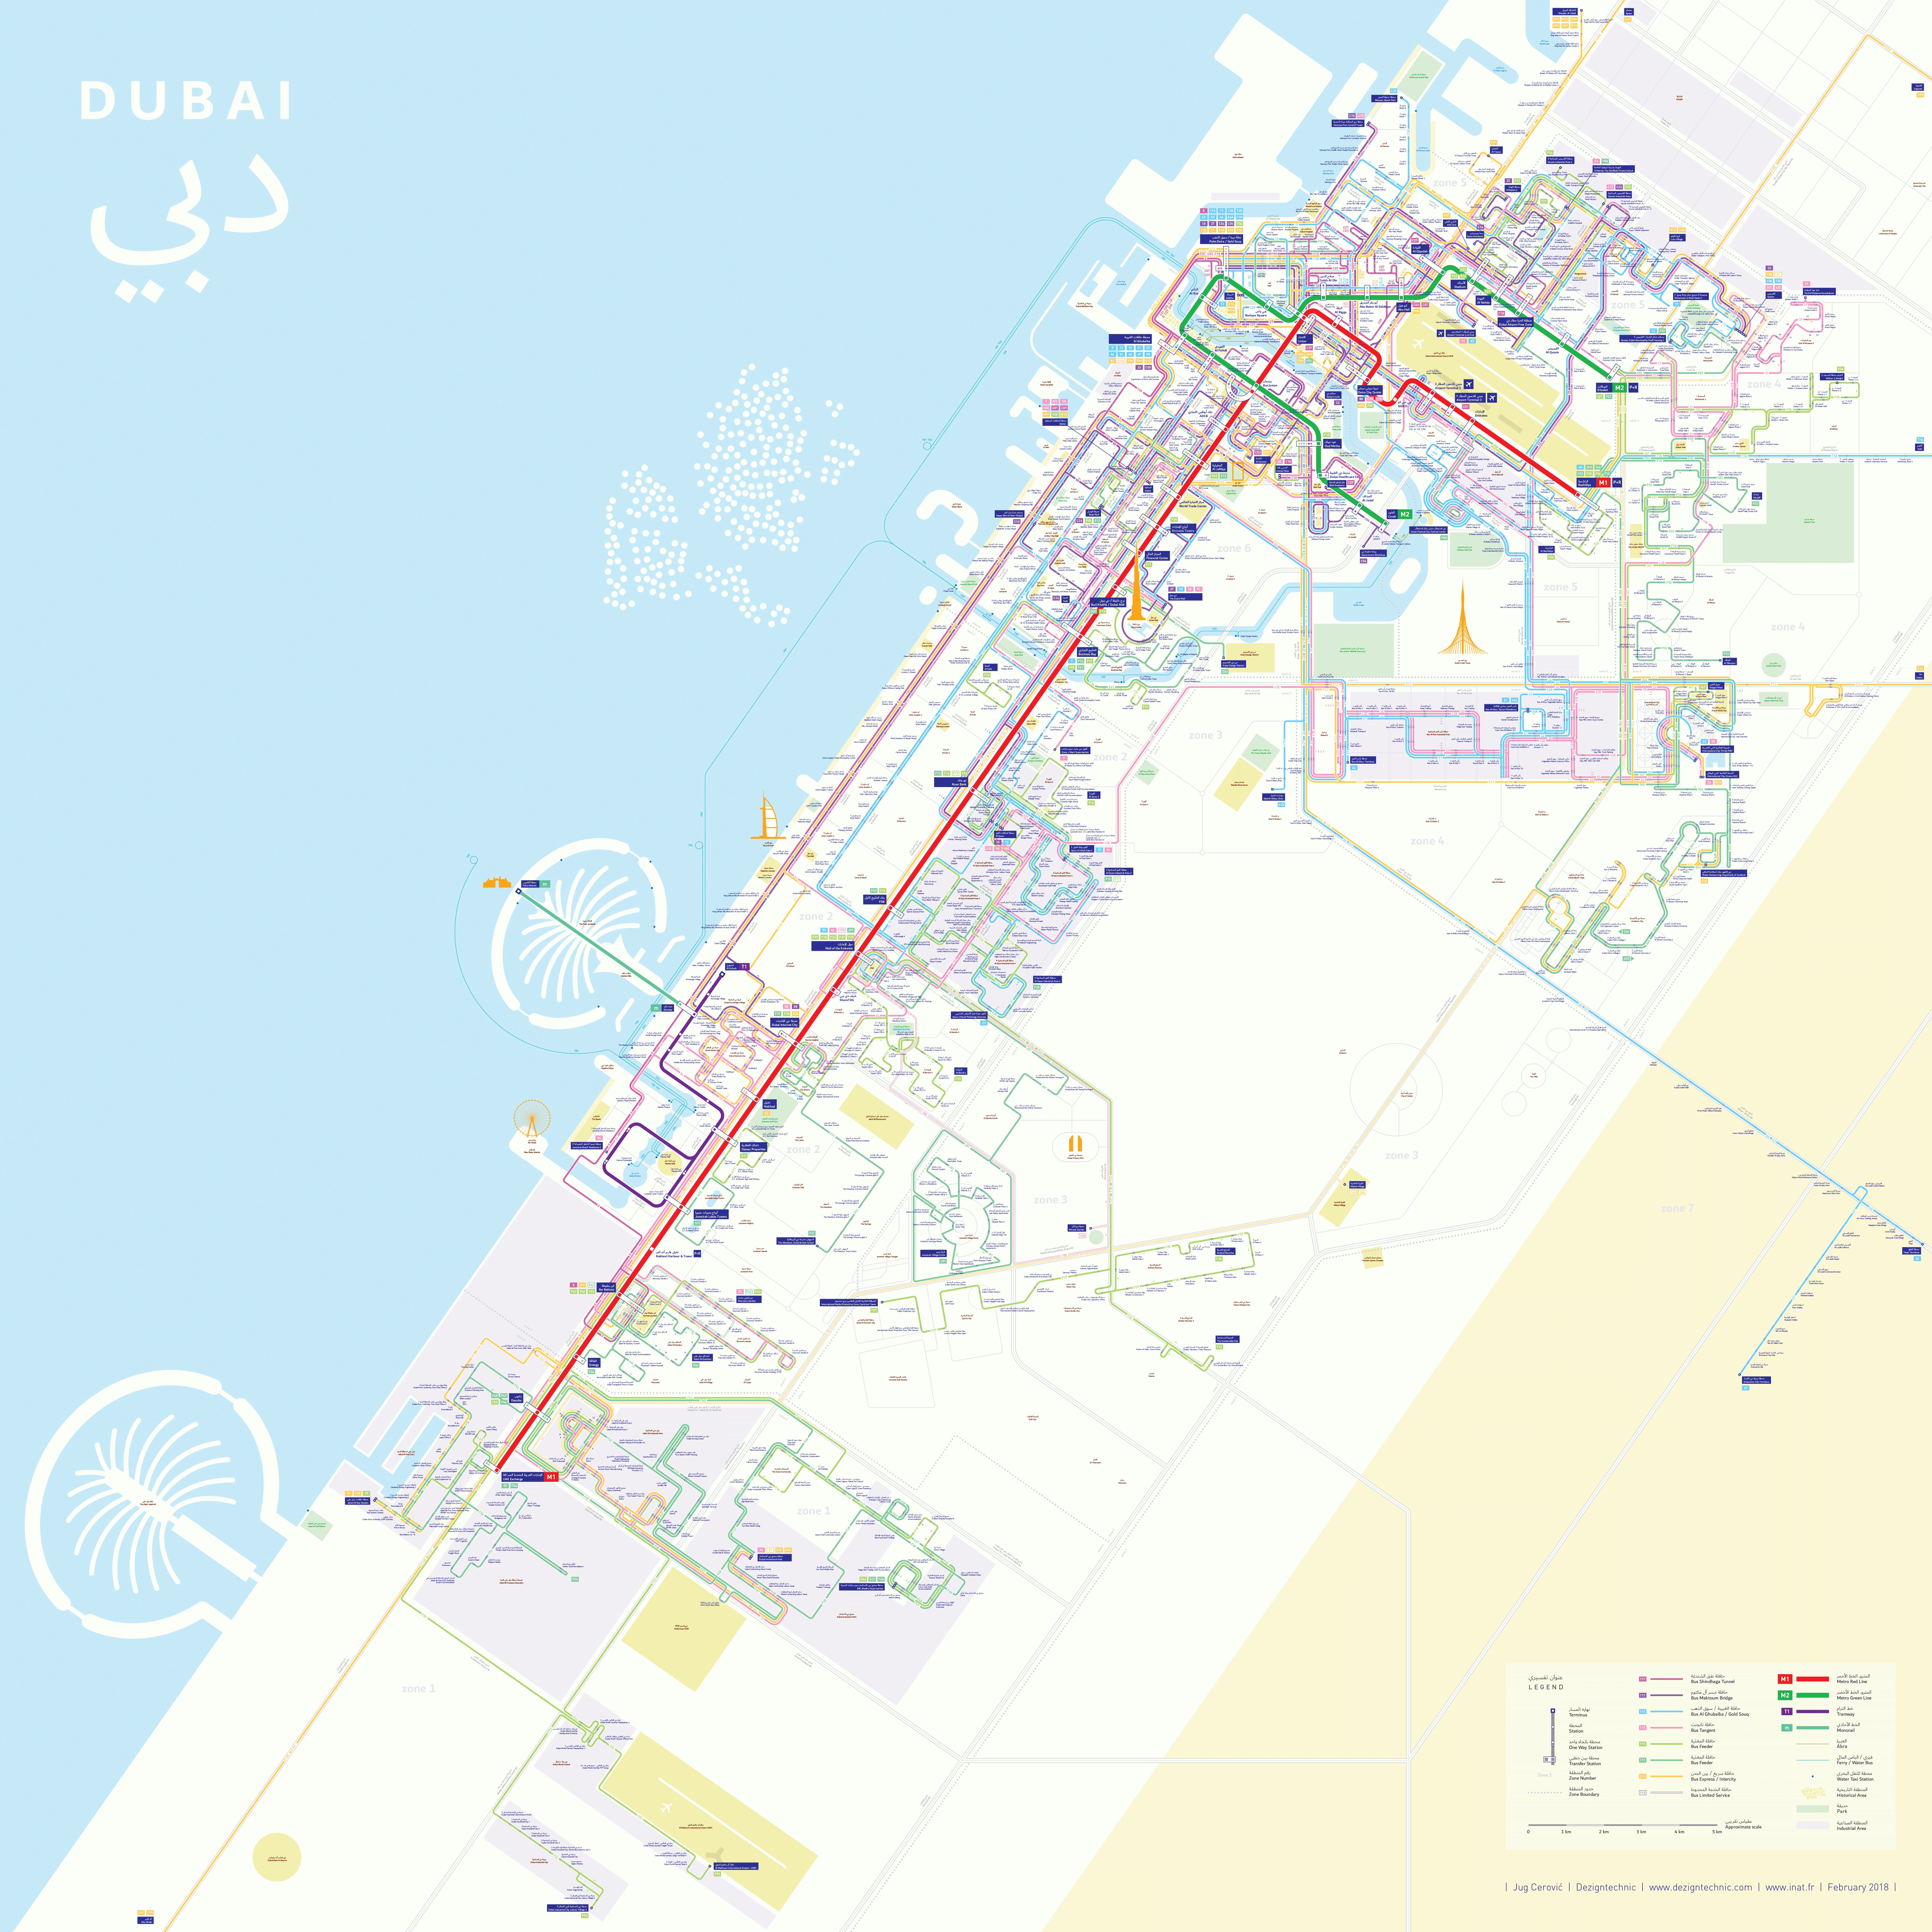 Dubai metro bus Mapping and Wayfinding